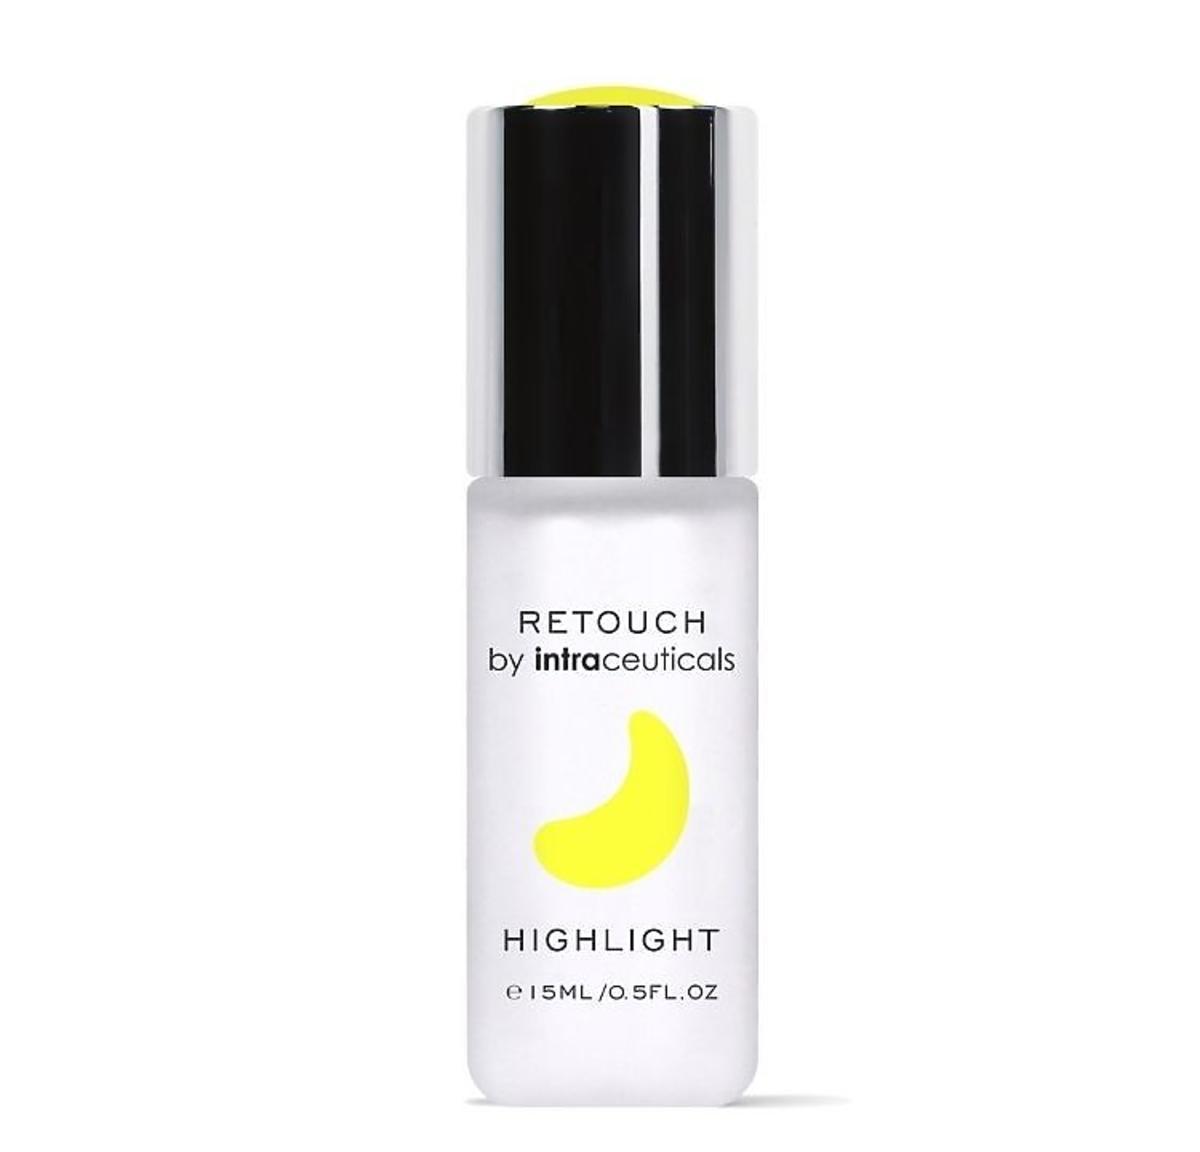 Serum Retouch Highlight INTRACEUTICALS